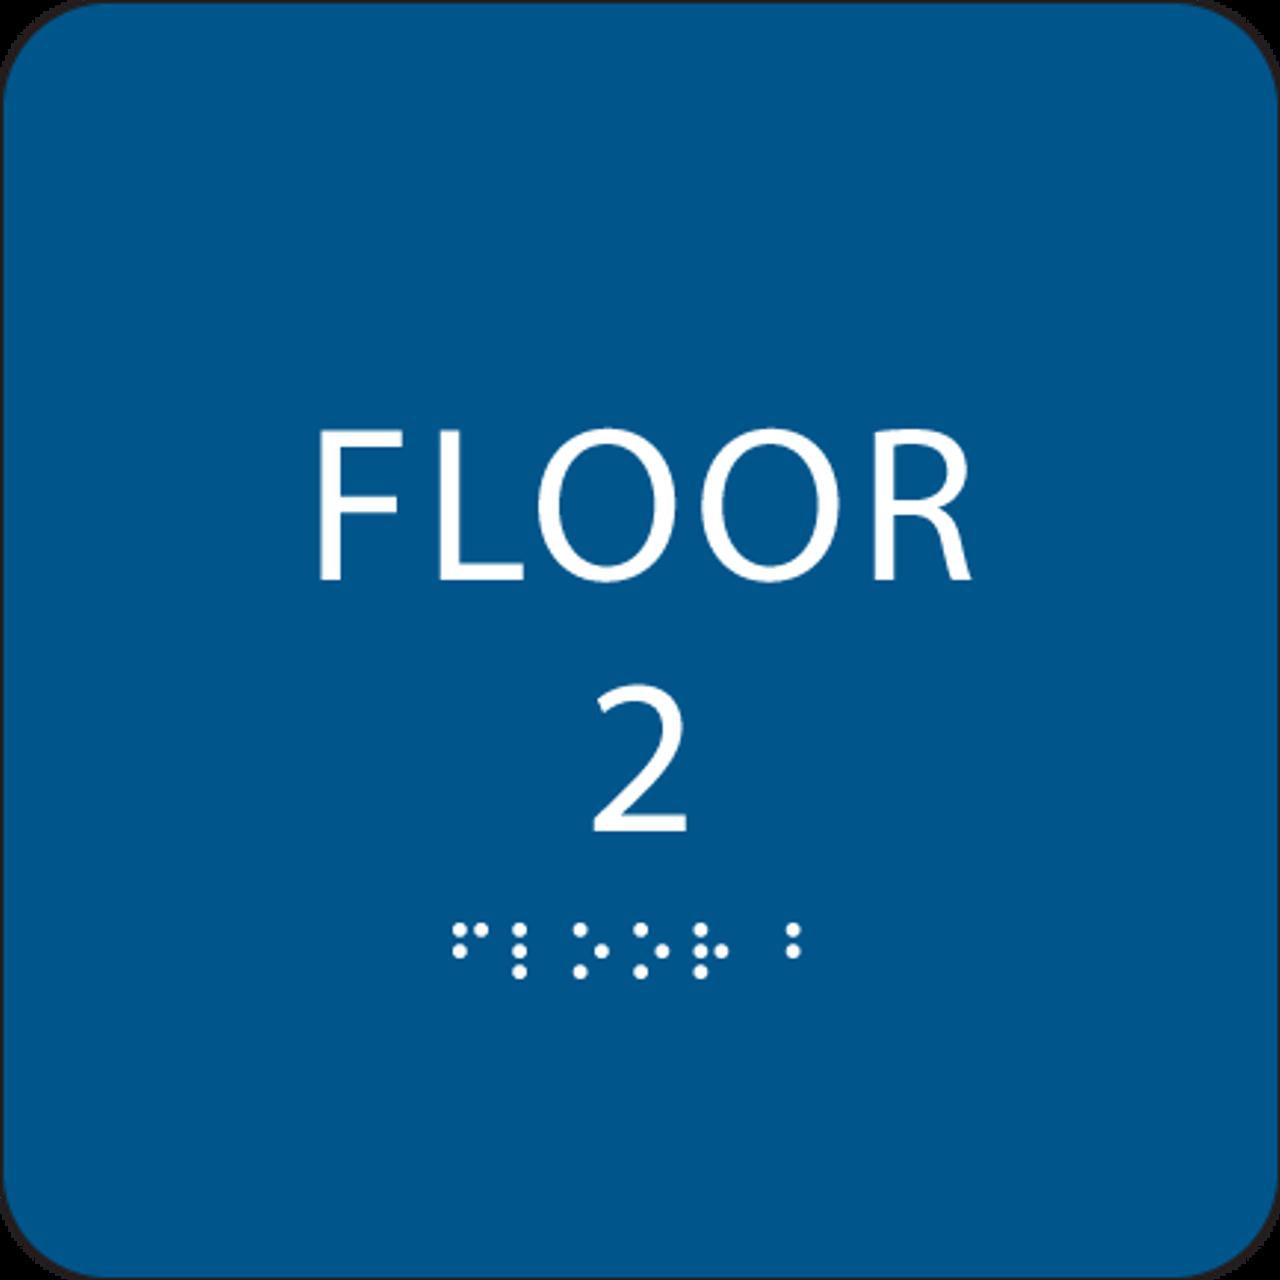 Blue Floor 2 Identification Sign